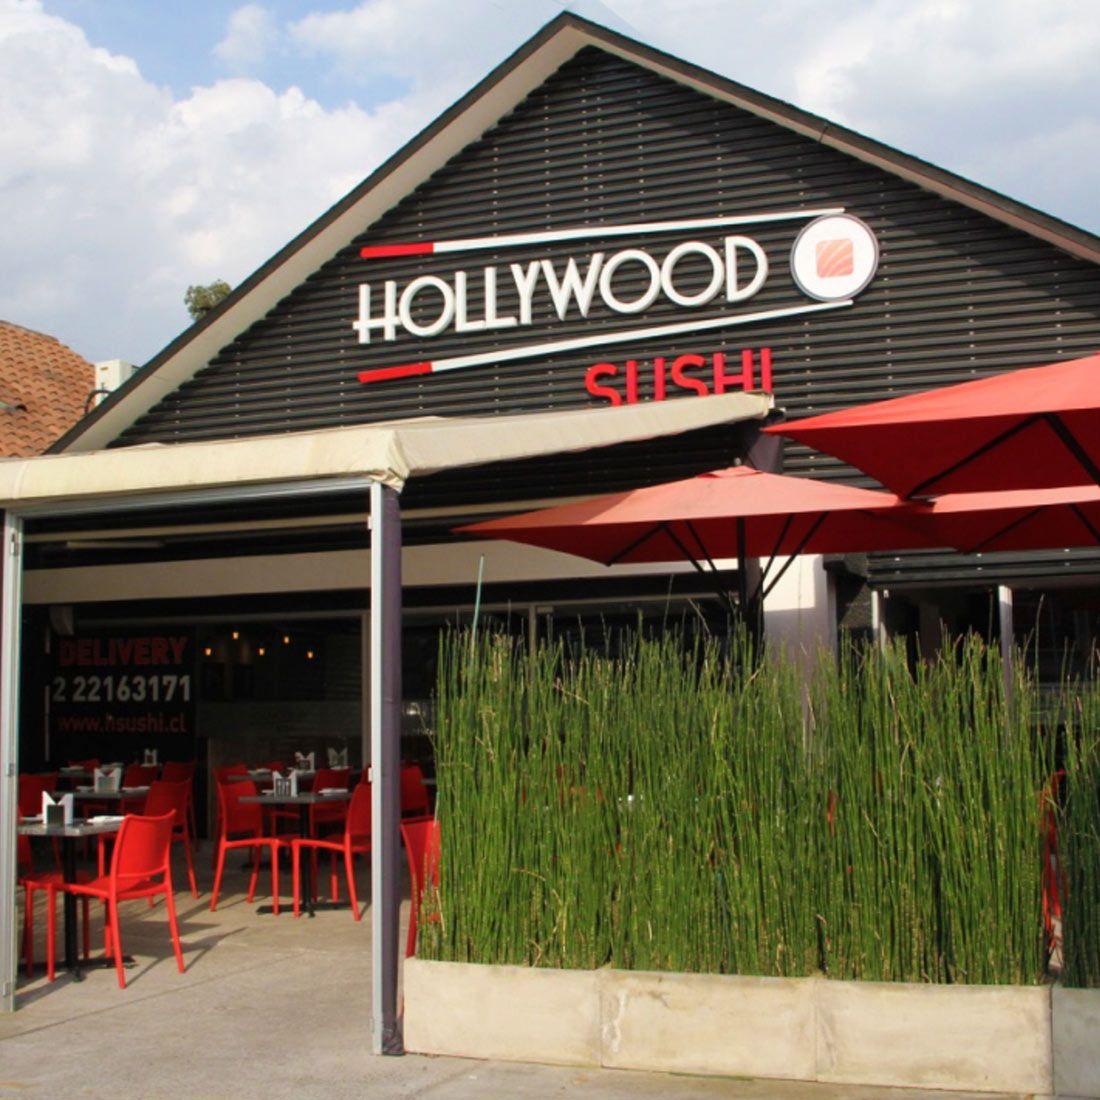 HOLLYWOOD SUSHI Restaurante - Reserva en restaurantes de Comida SUSHI - LO BARNECHEA - MESA 24/7 | SANTIAGO - Perú